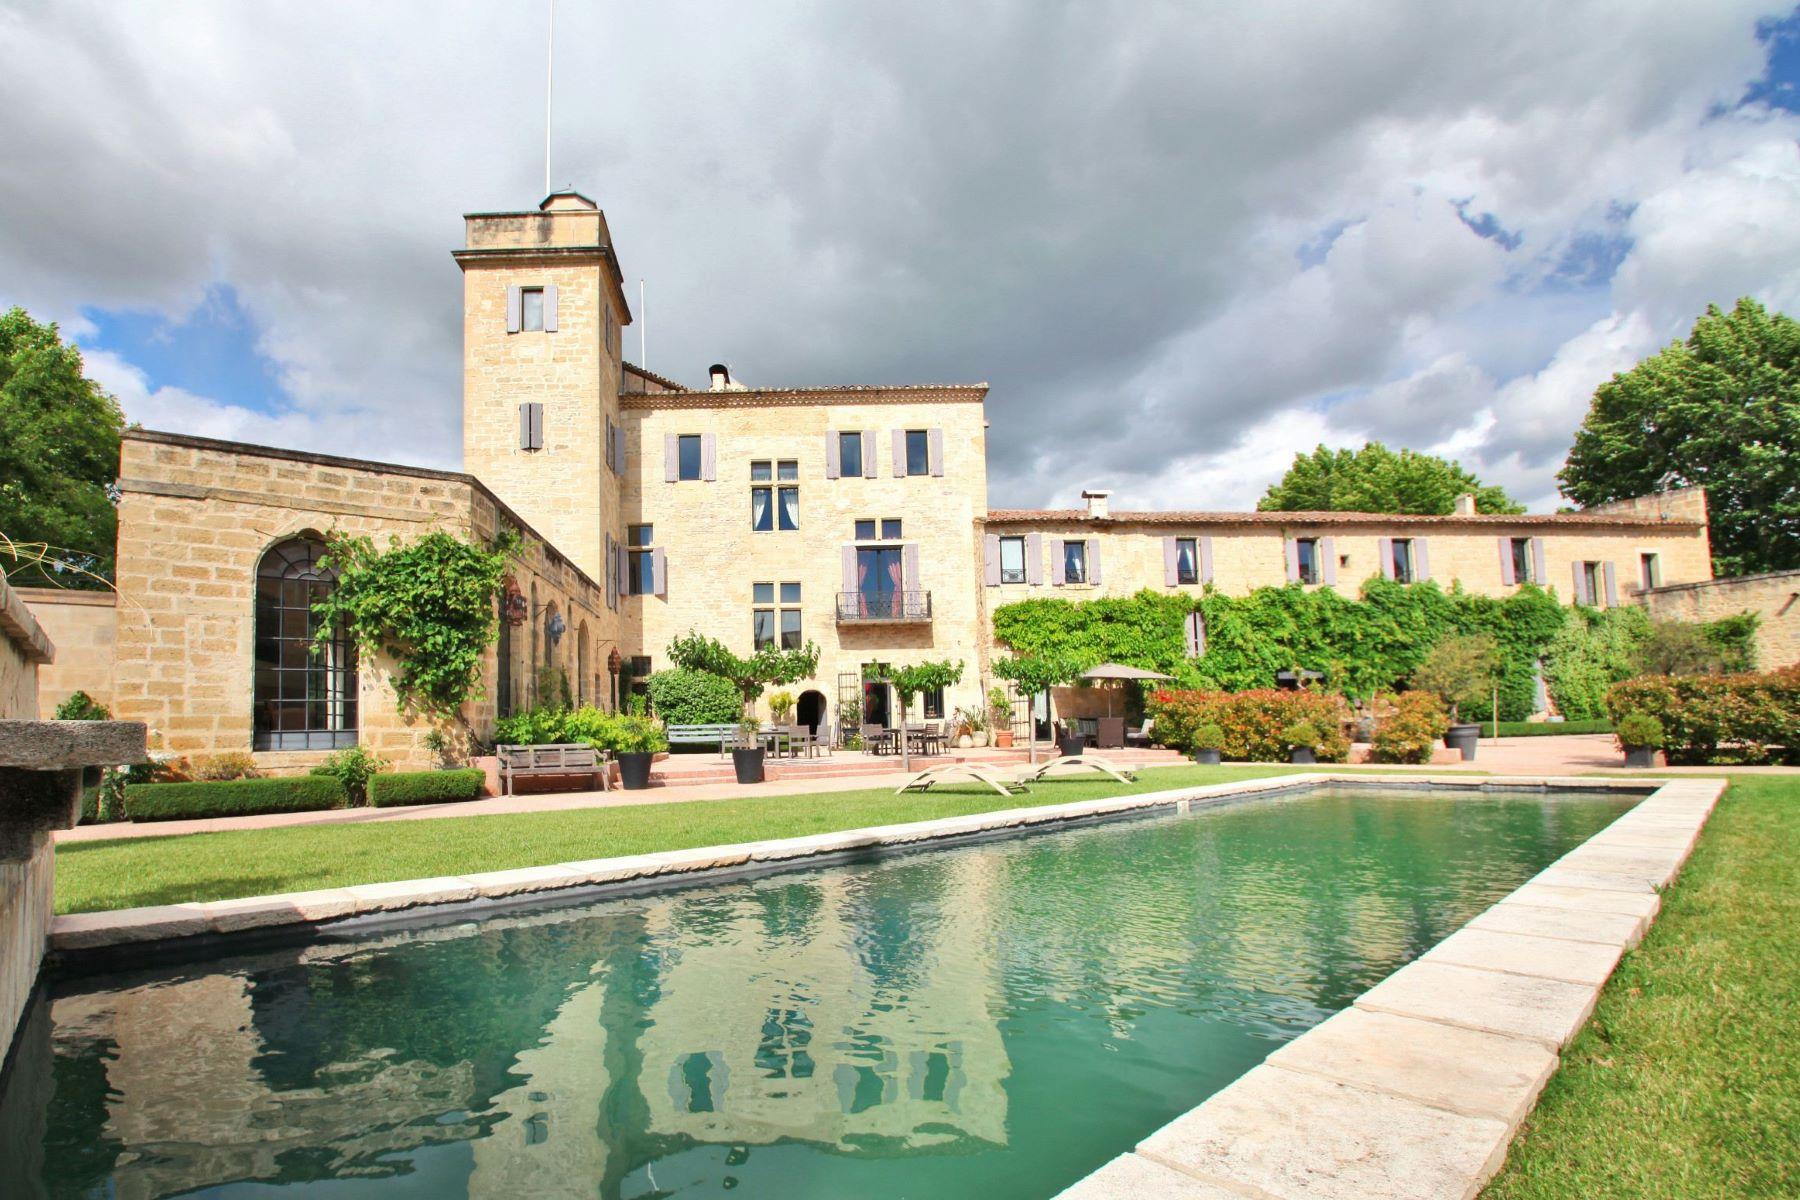 Casa Unifamiliar por un Venta en BEAUTIFUL PROPERTY AT 10 MI FROM THE SEA Montpellier, Languedoc-Rosellón, 34000 Francia